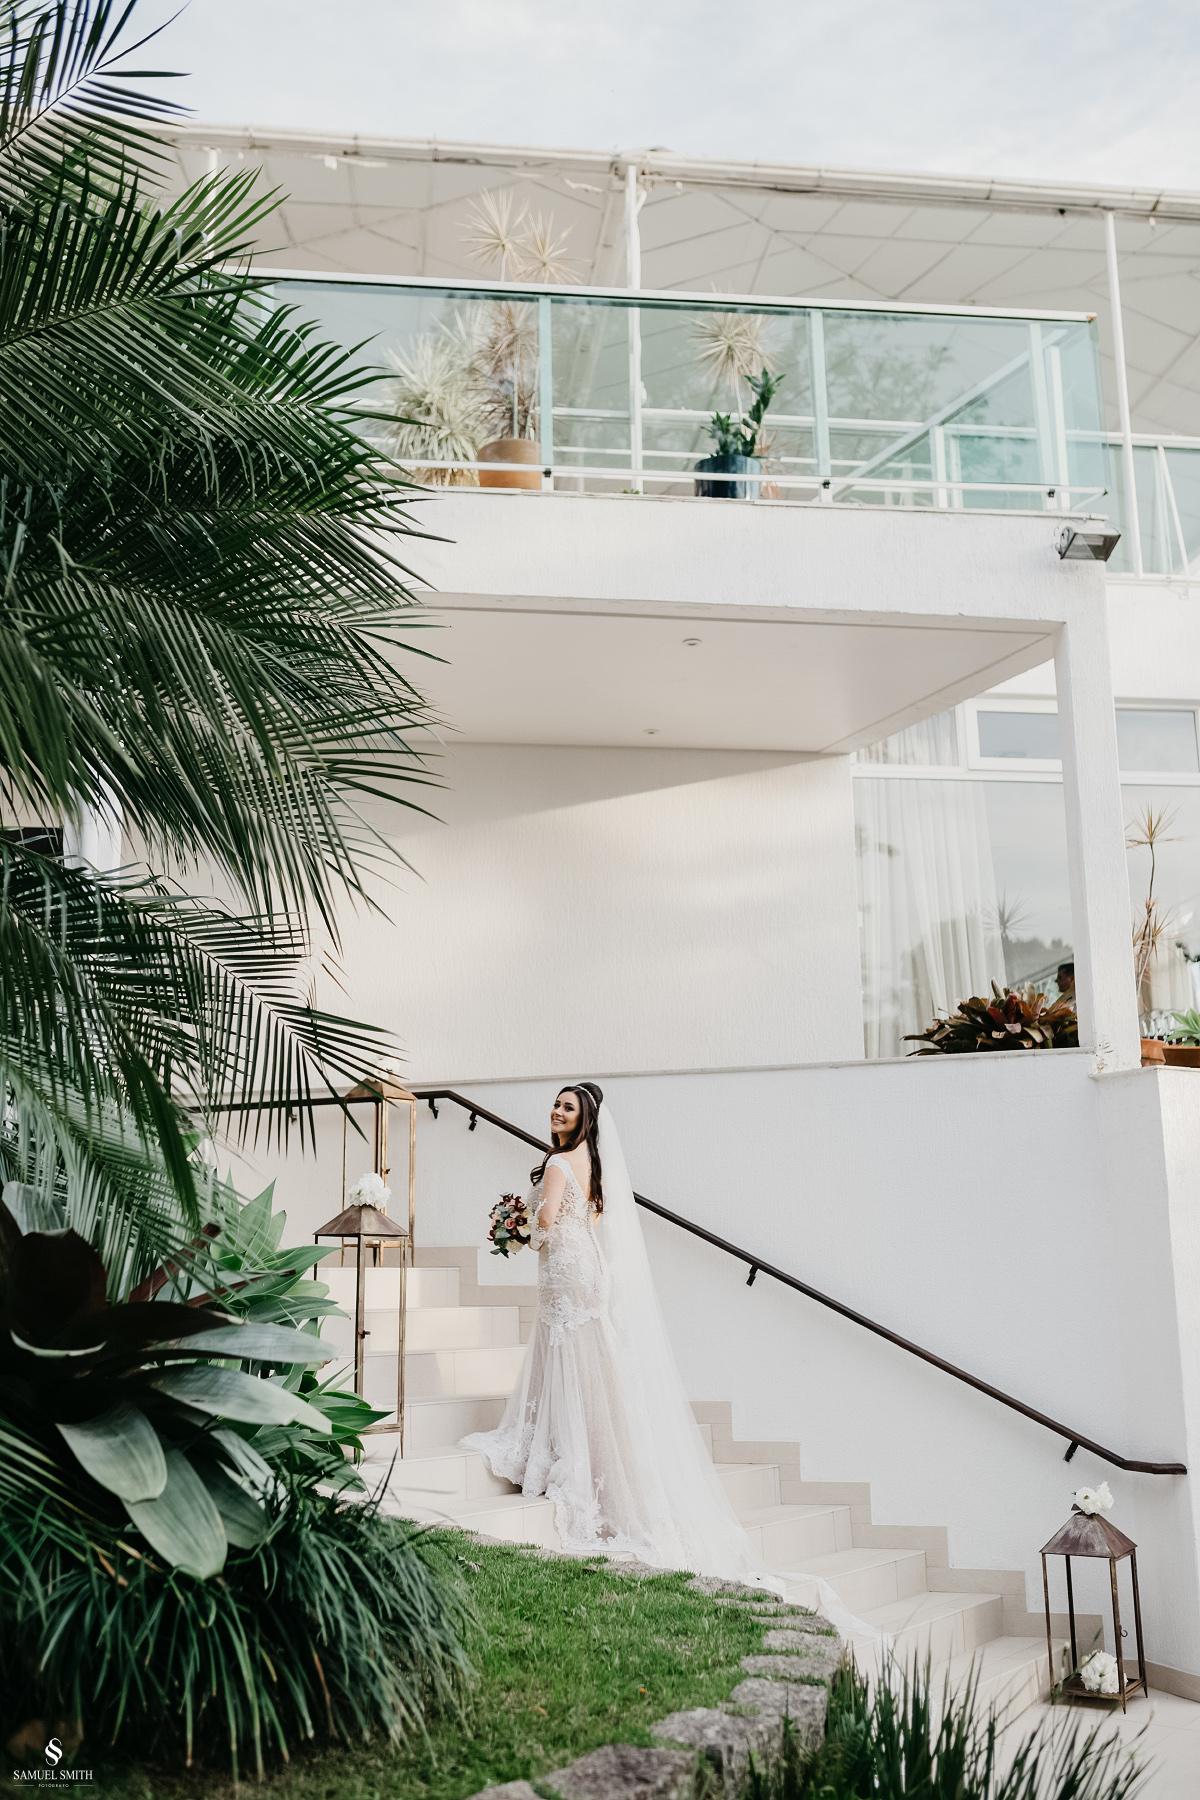 casamento militar terraço cacupe florianópolis sc floripa wedding fotógrafo samuel smith (85)